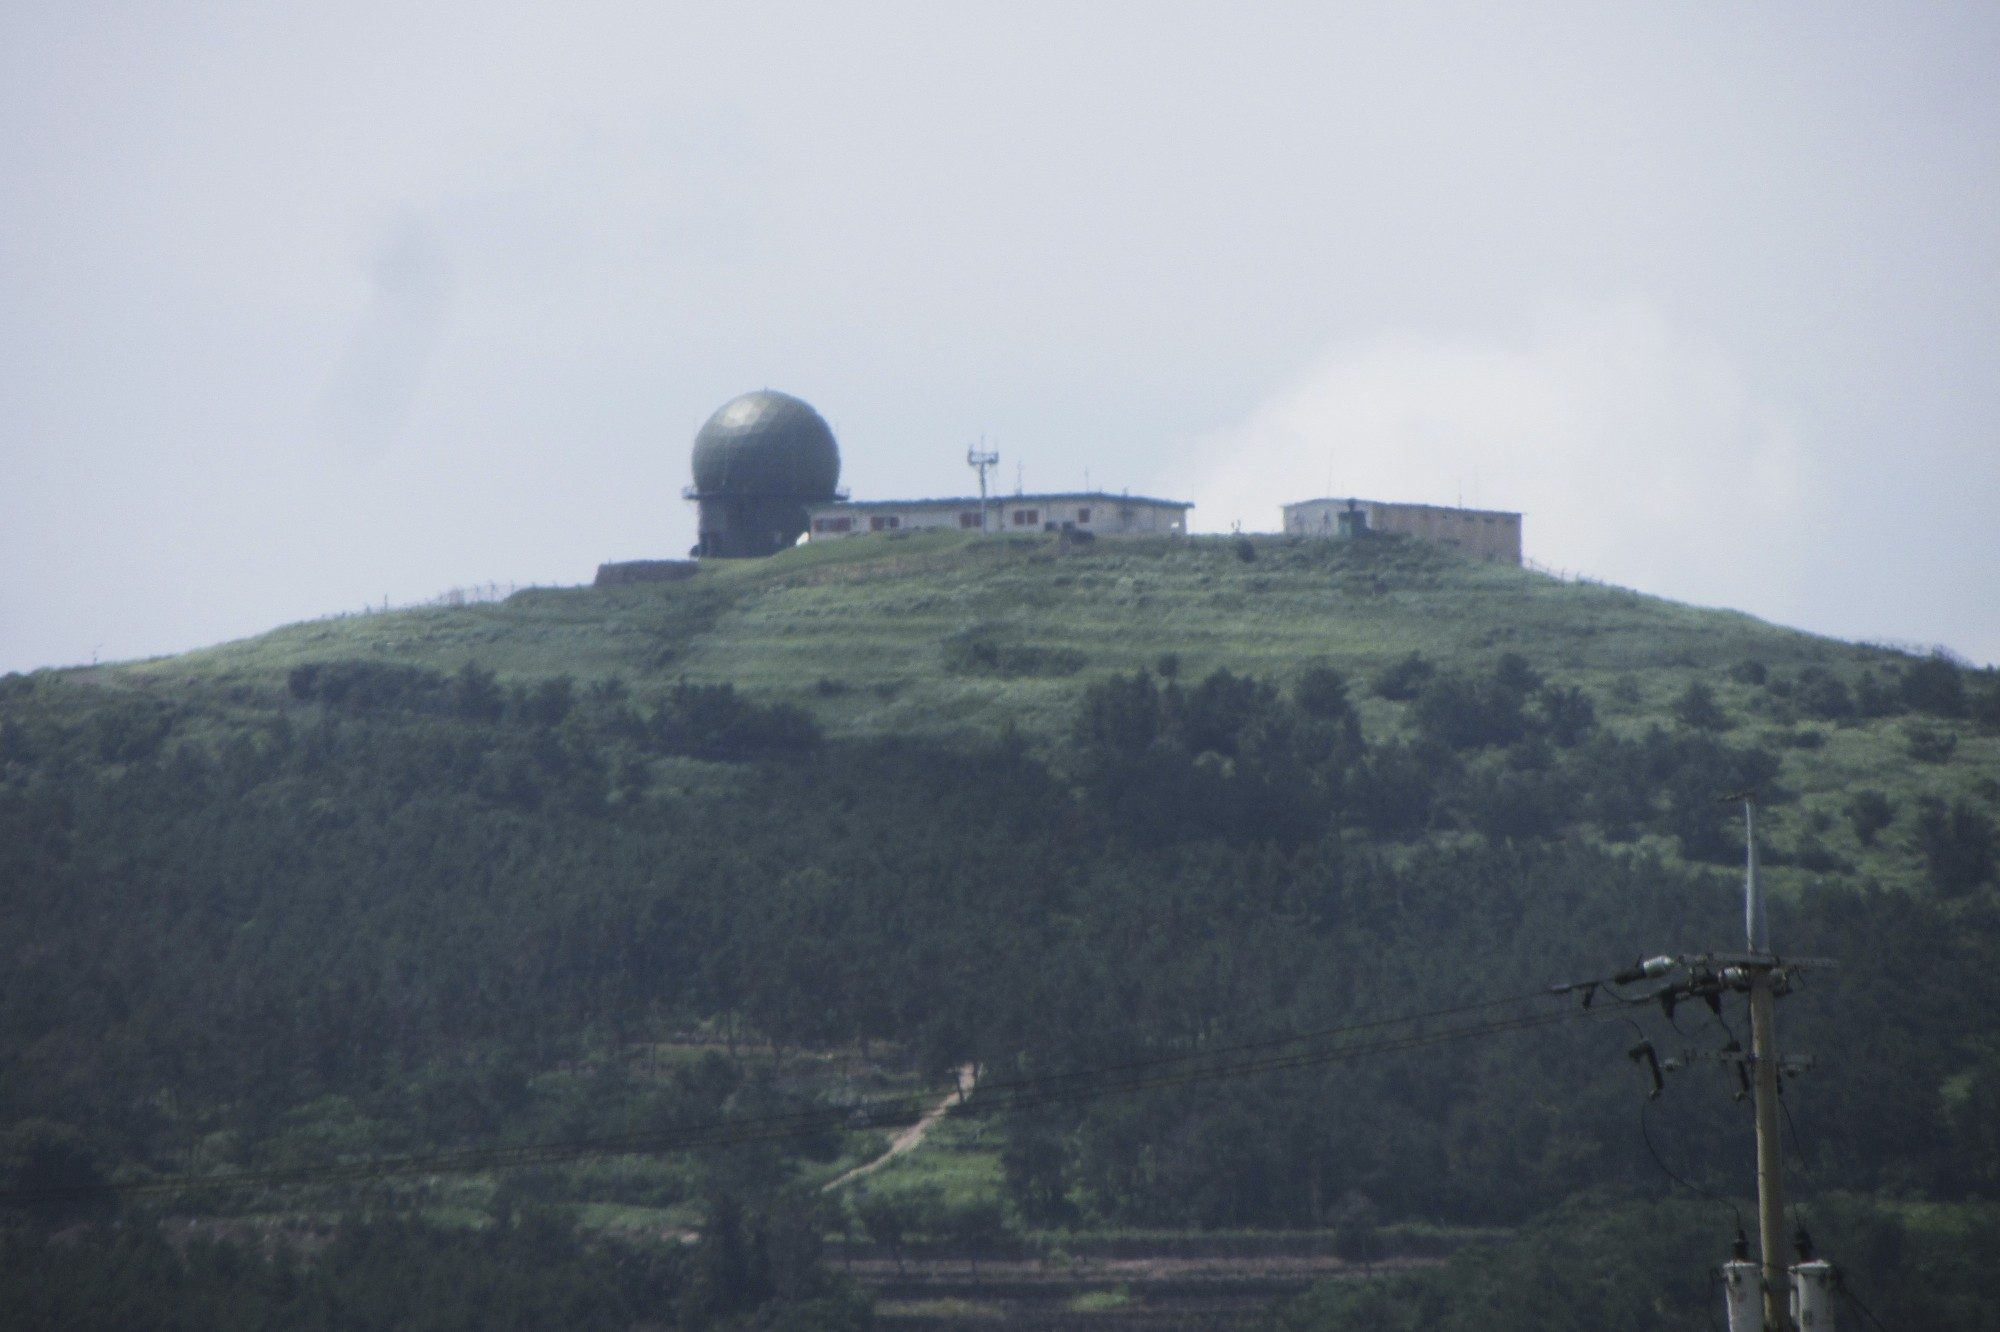 Moseulpo Radar Base, formerly U.S. Camp McNabb.